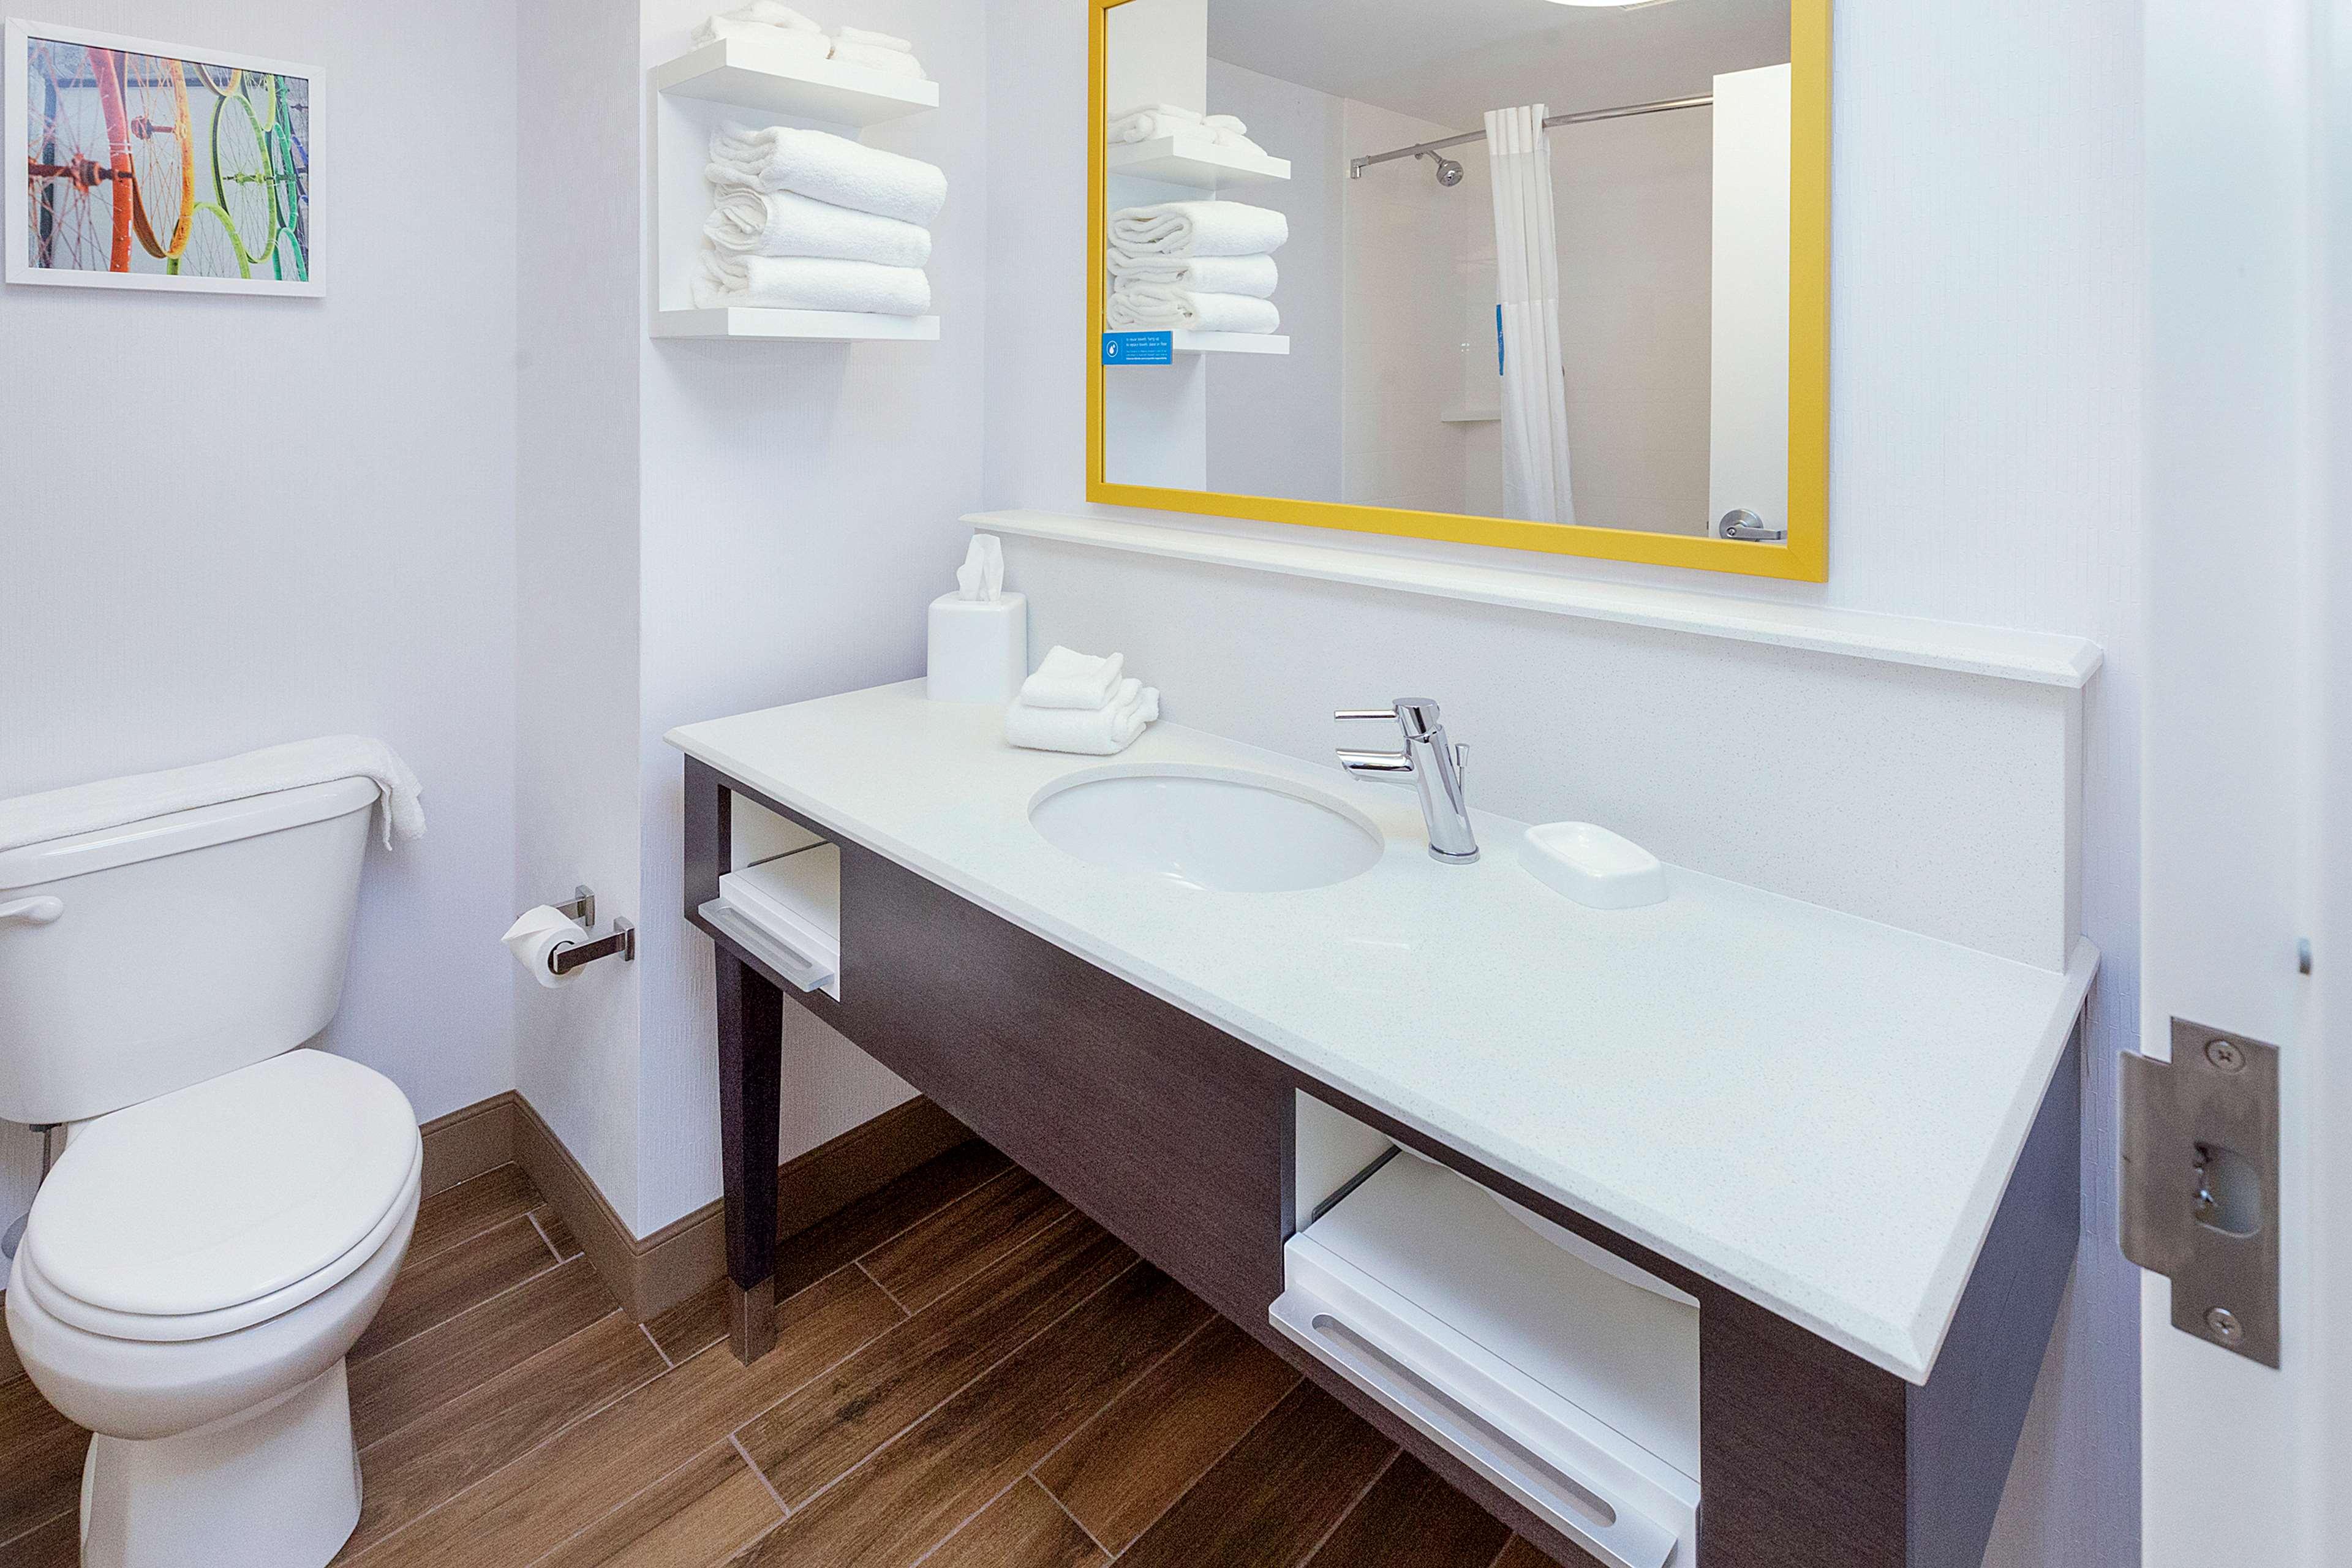 Hampton Inn & Suites Morgantown / University Town Centre image 15